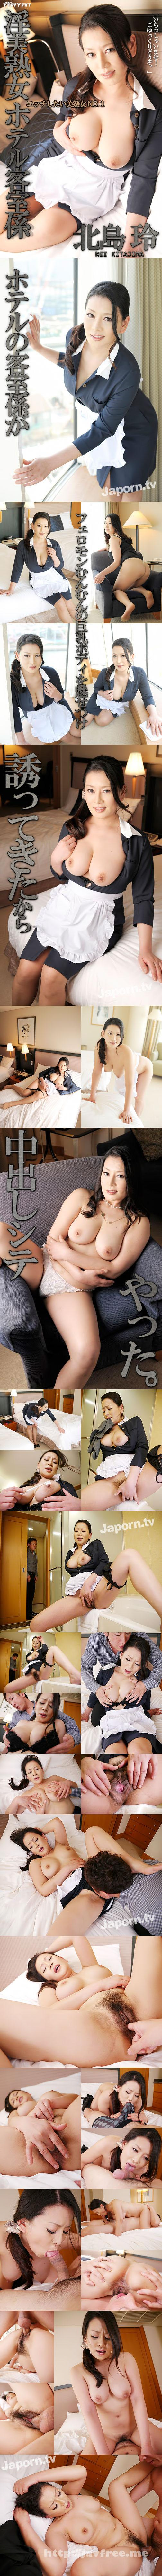 [BT-120] 淫美熟女ホテル客室係 : 北島玲 - image BT-120b on https://javfree.me